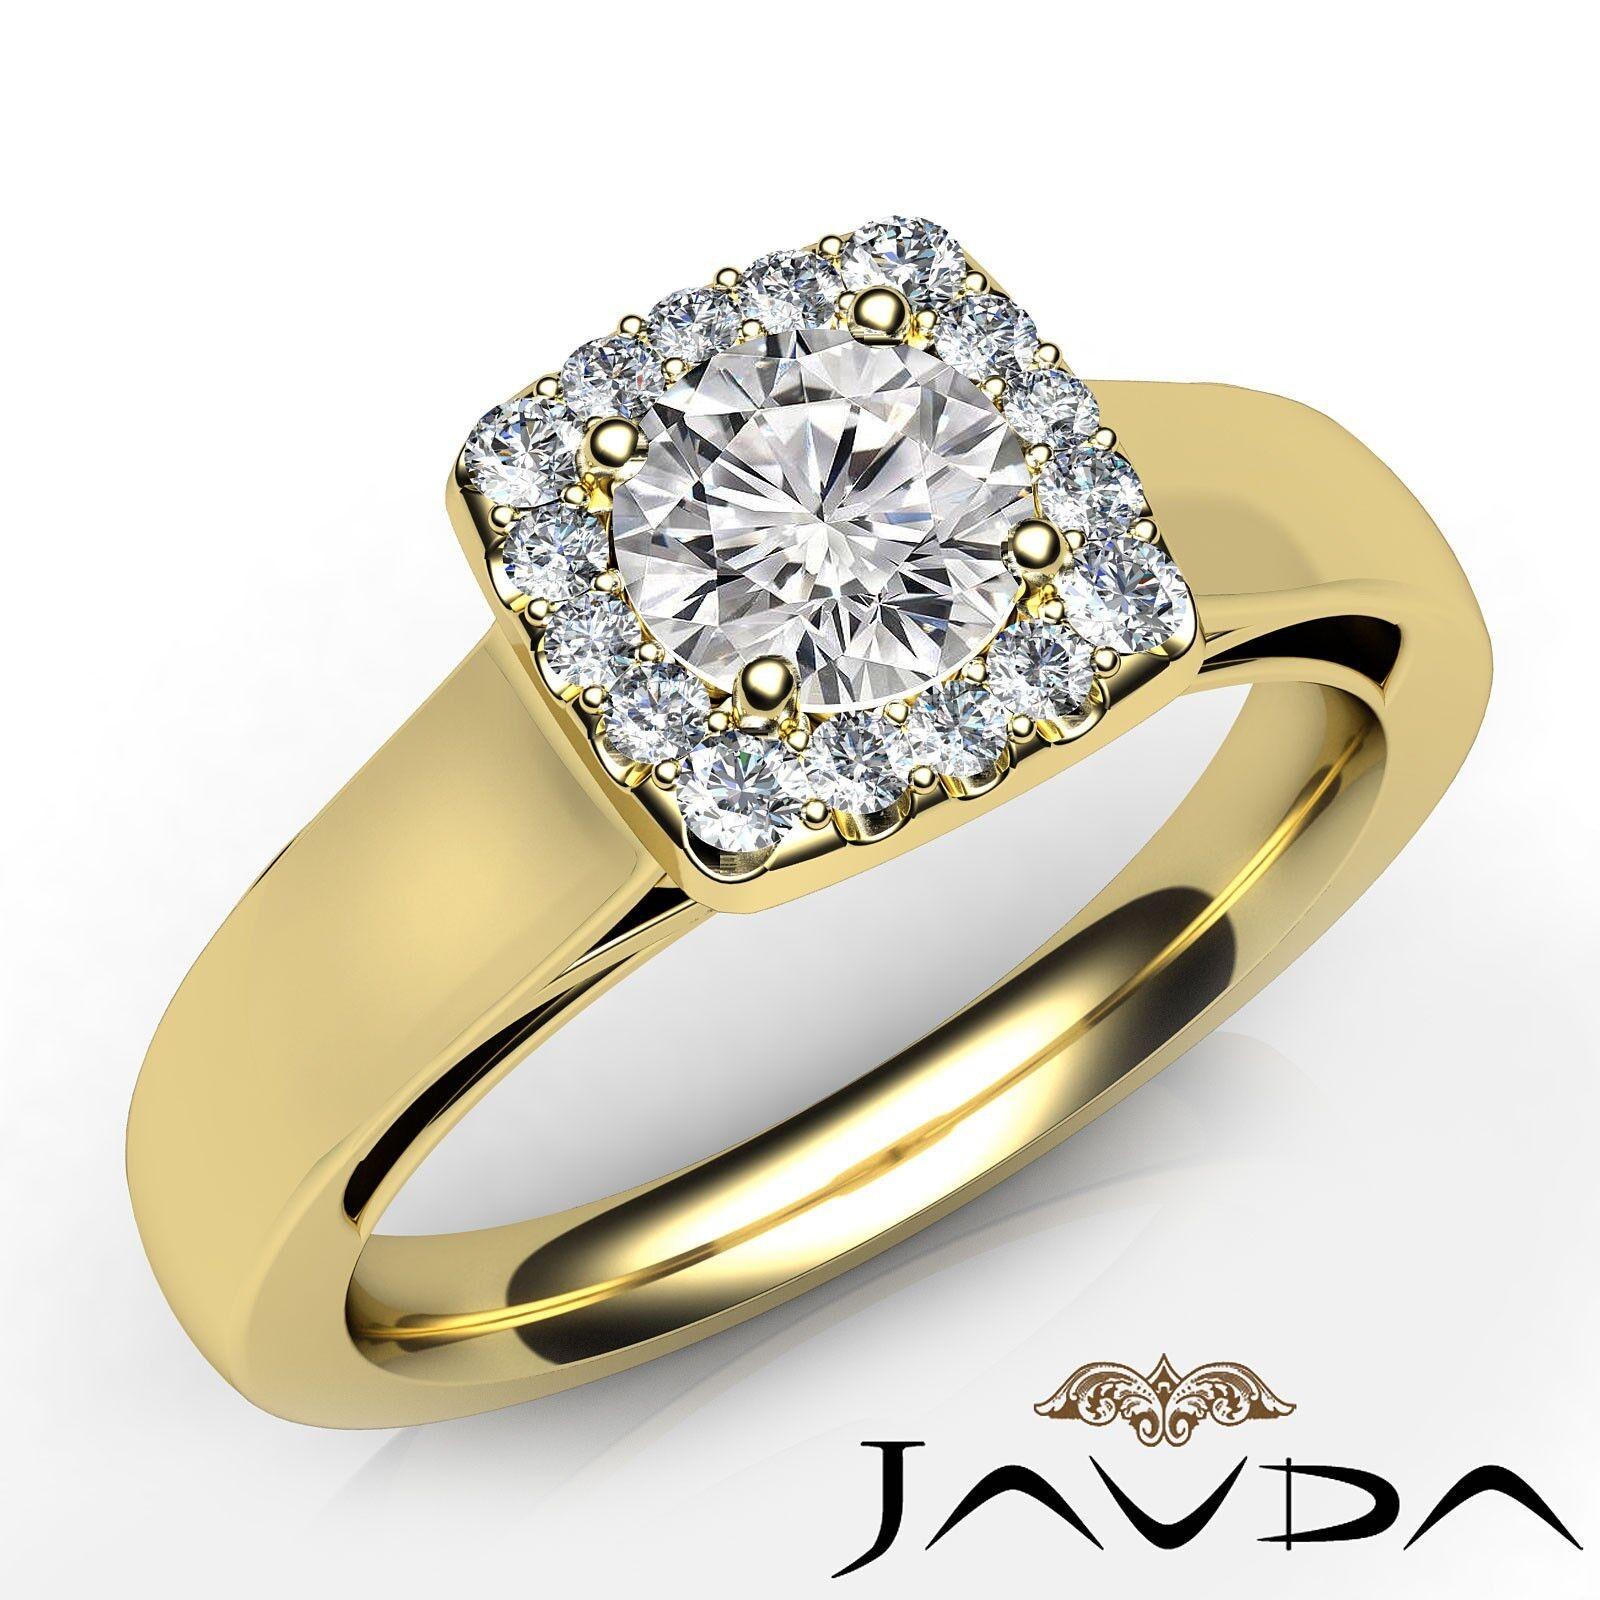 Halo Filigree Round Diamond Engagement Prong Setting Ring GIA E Color VS1 0.7Ct